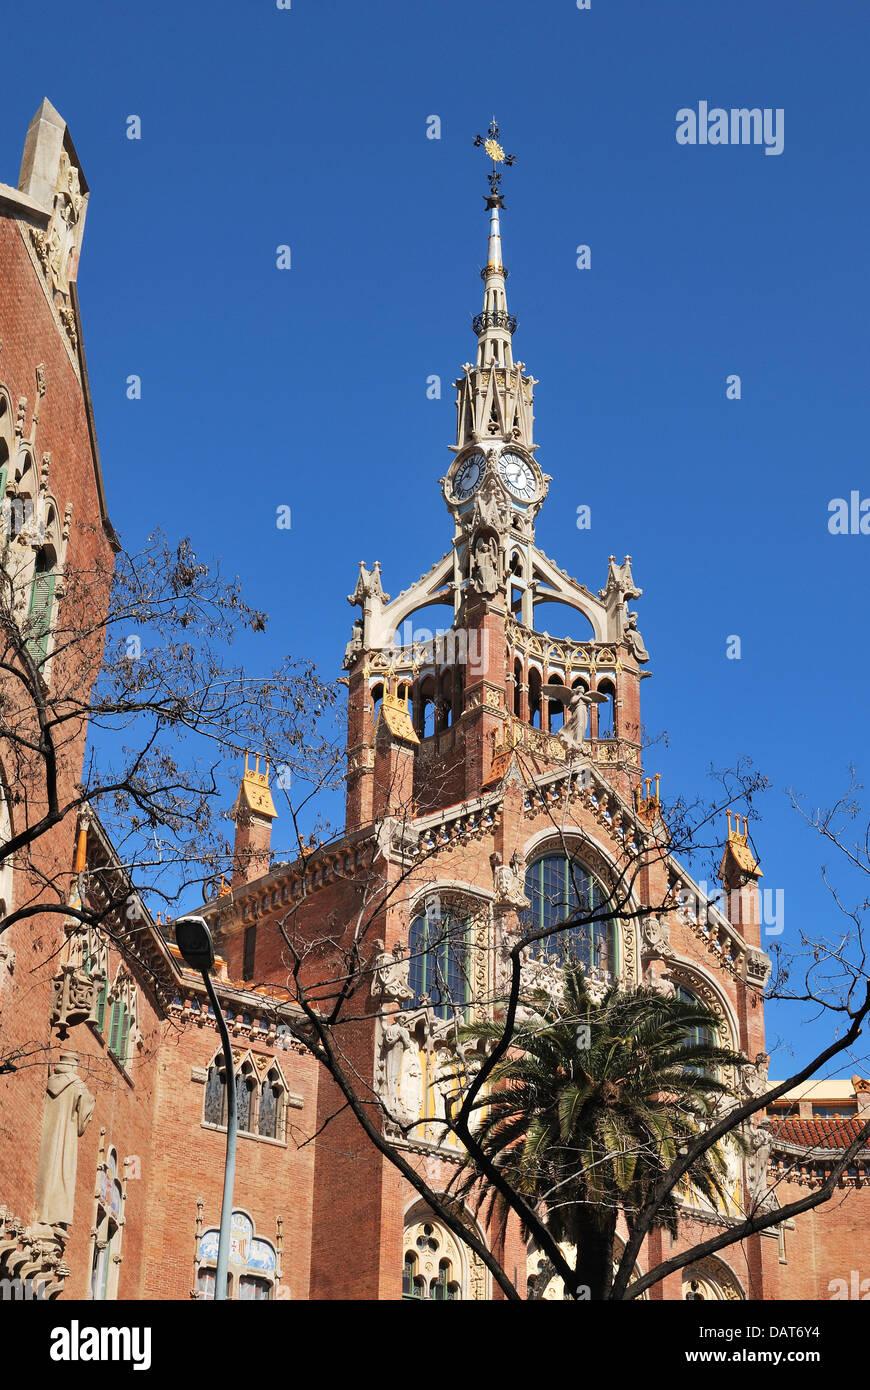 Hospital of Saint Paul ( Hospital de Sant Pau). Built 1930. Barcelona. Catalonia. Spain. Clocktower and spire. - Stock Image